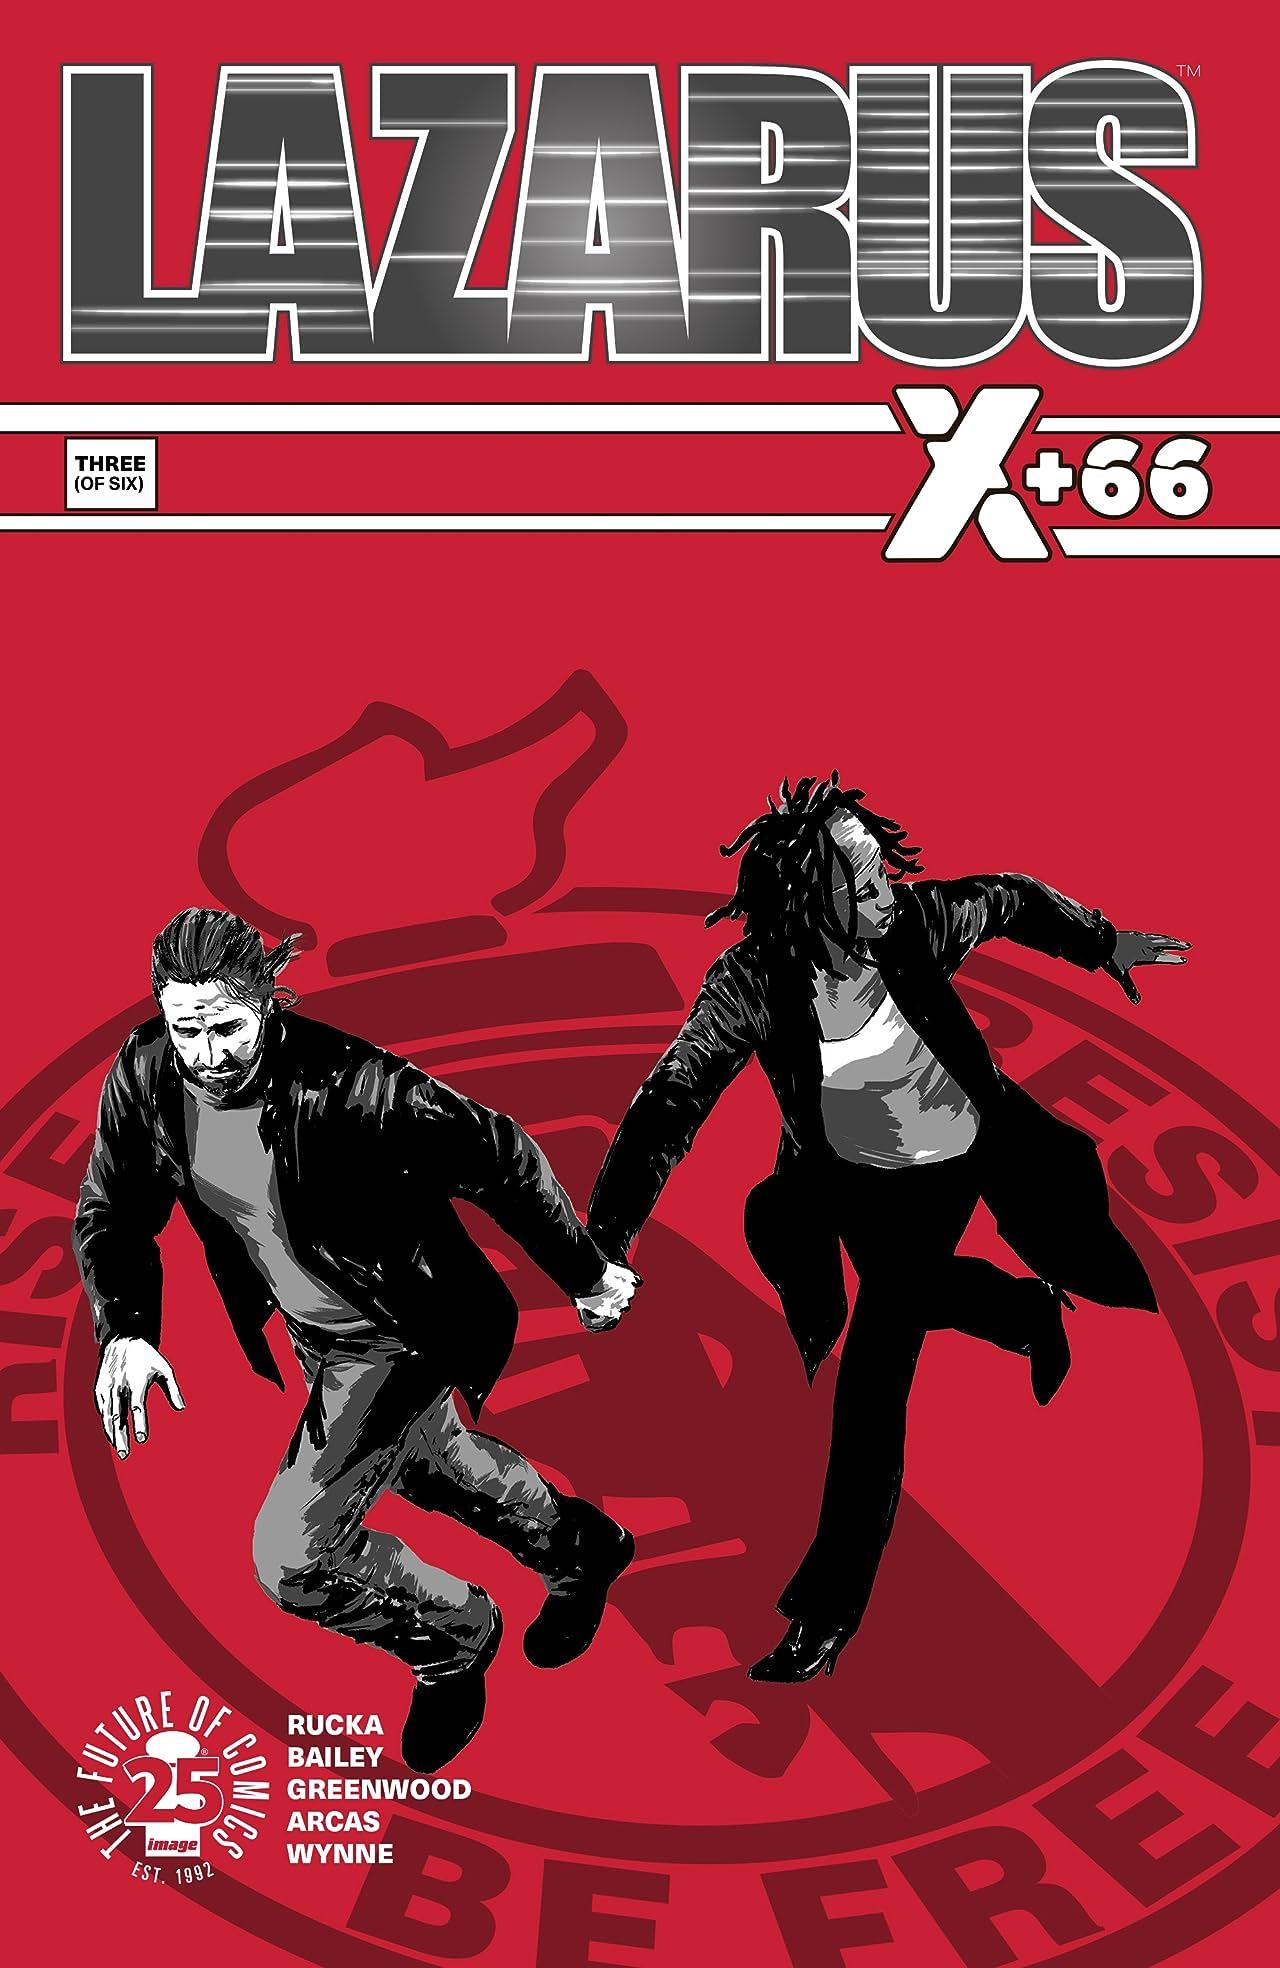 Lazarus: X+66 #3 (of 6)